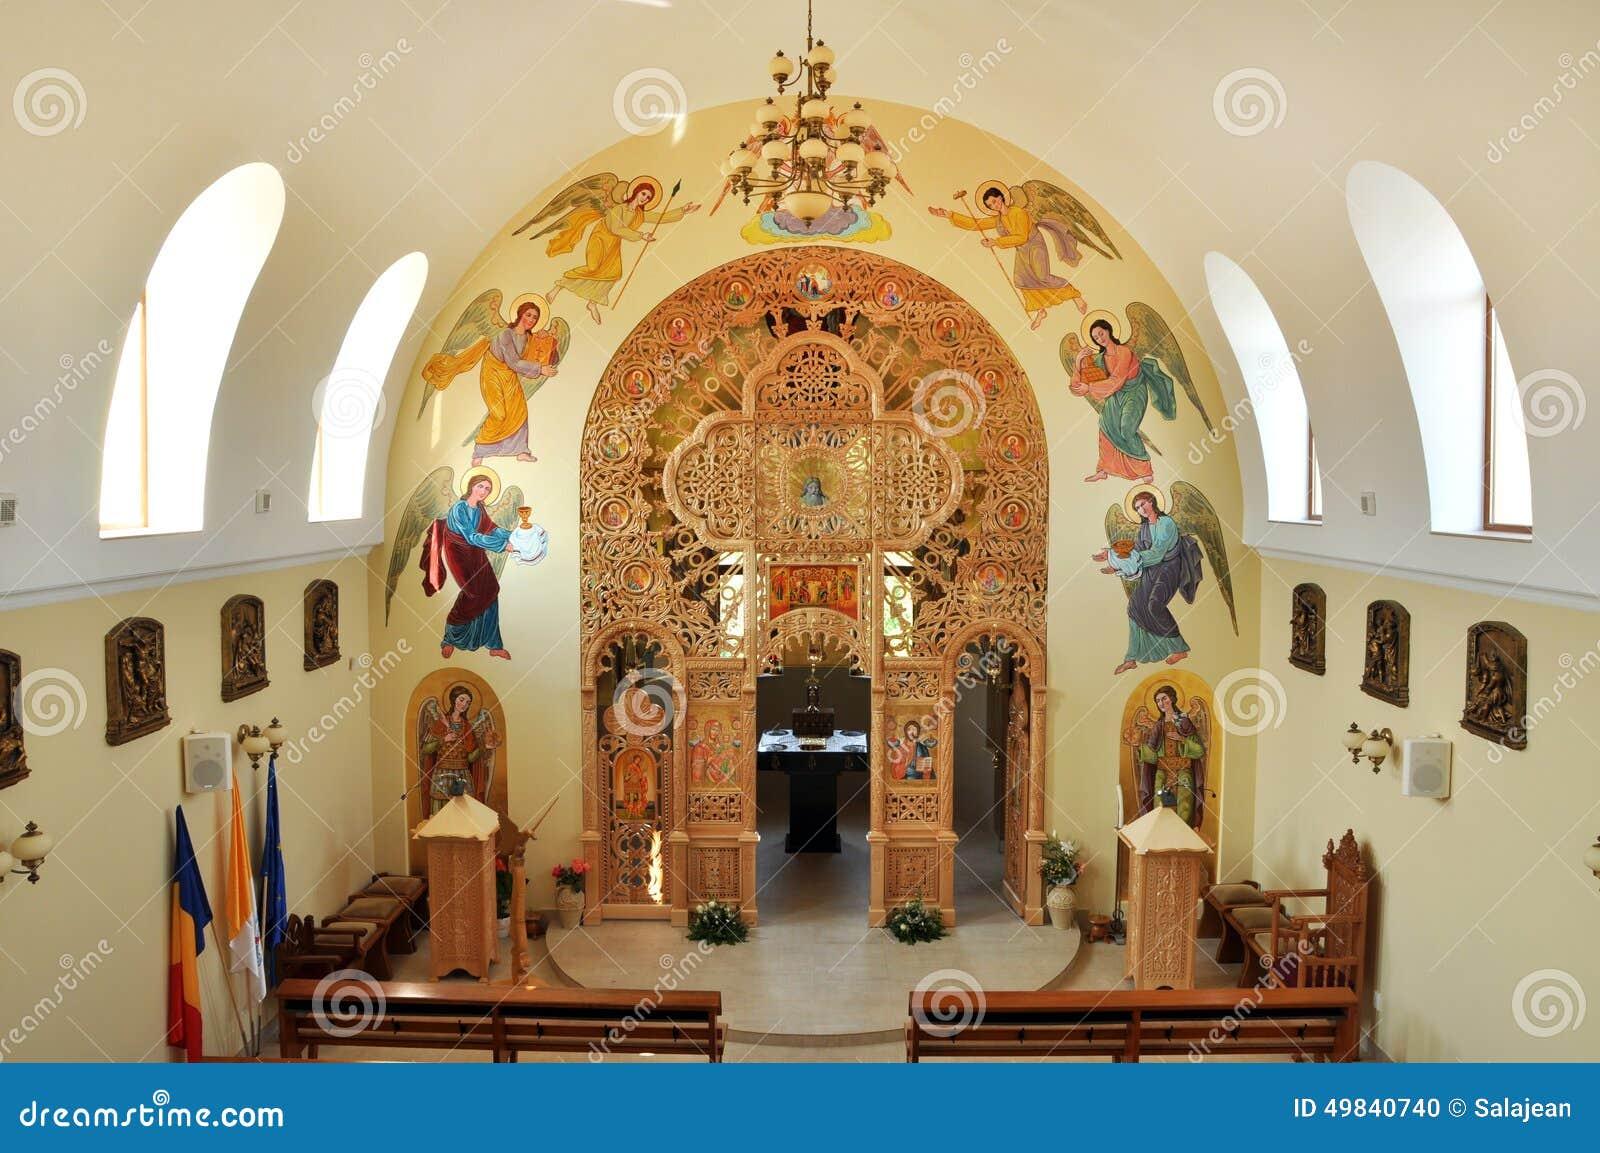 Iconostas in greek orthodox basilica of st george editorial .